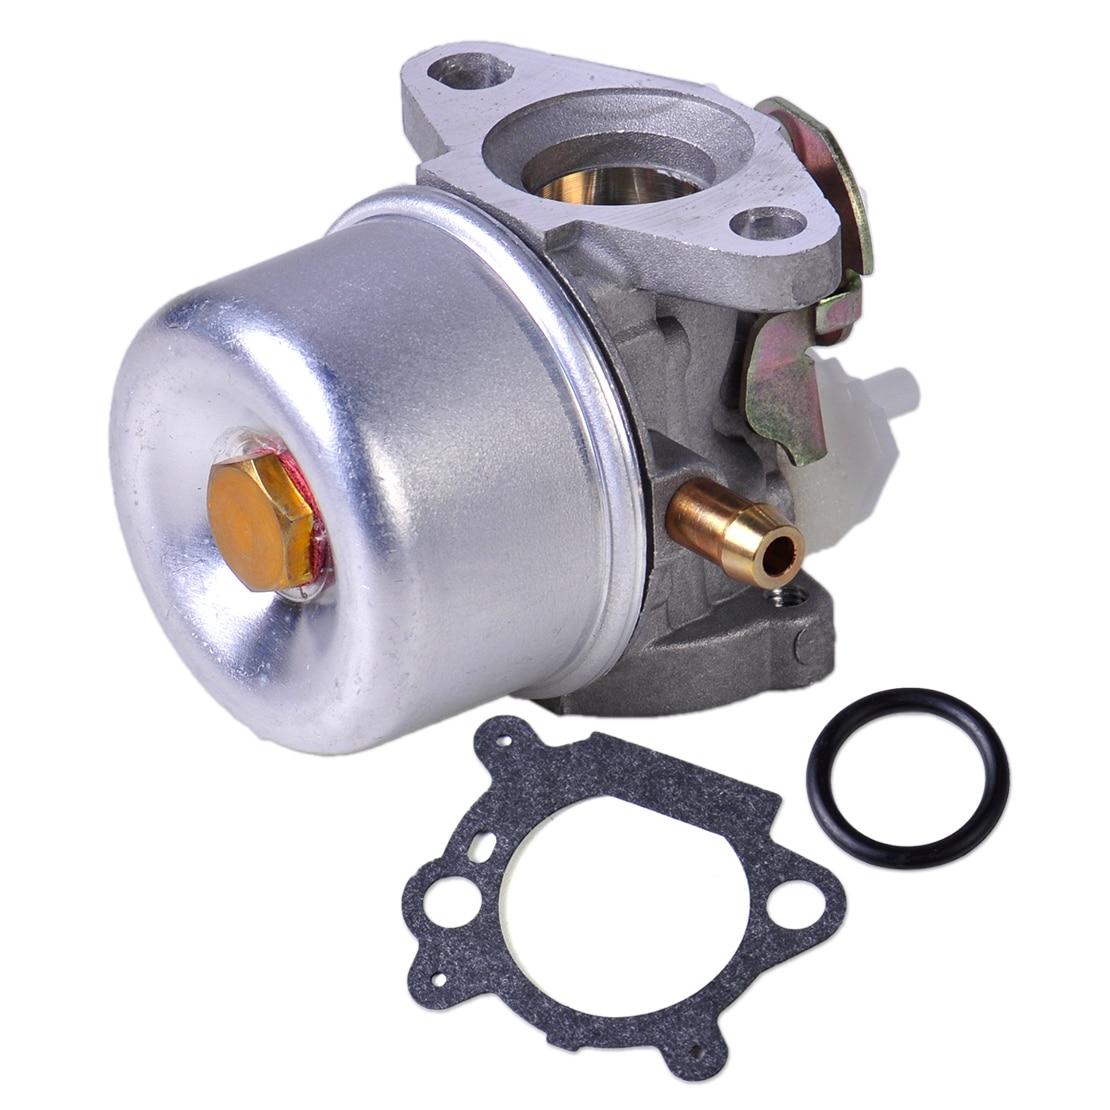 LETAOSK Carburetor Carb W/Gasket Fit For Briggs & Stratton 799869 792253 Lawnmower Pressure WasherAccessories